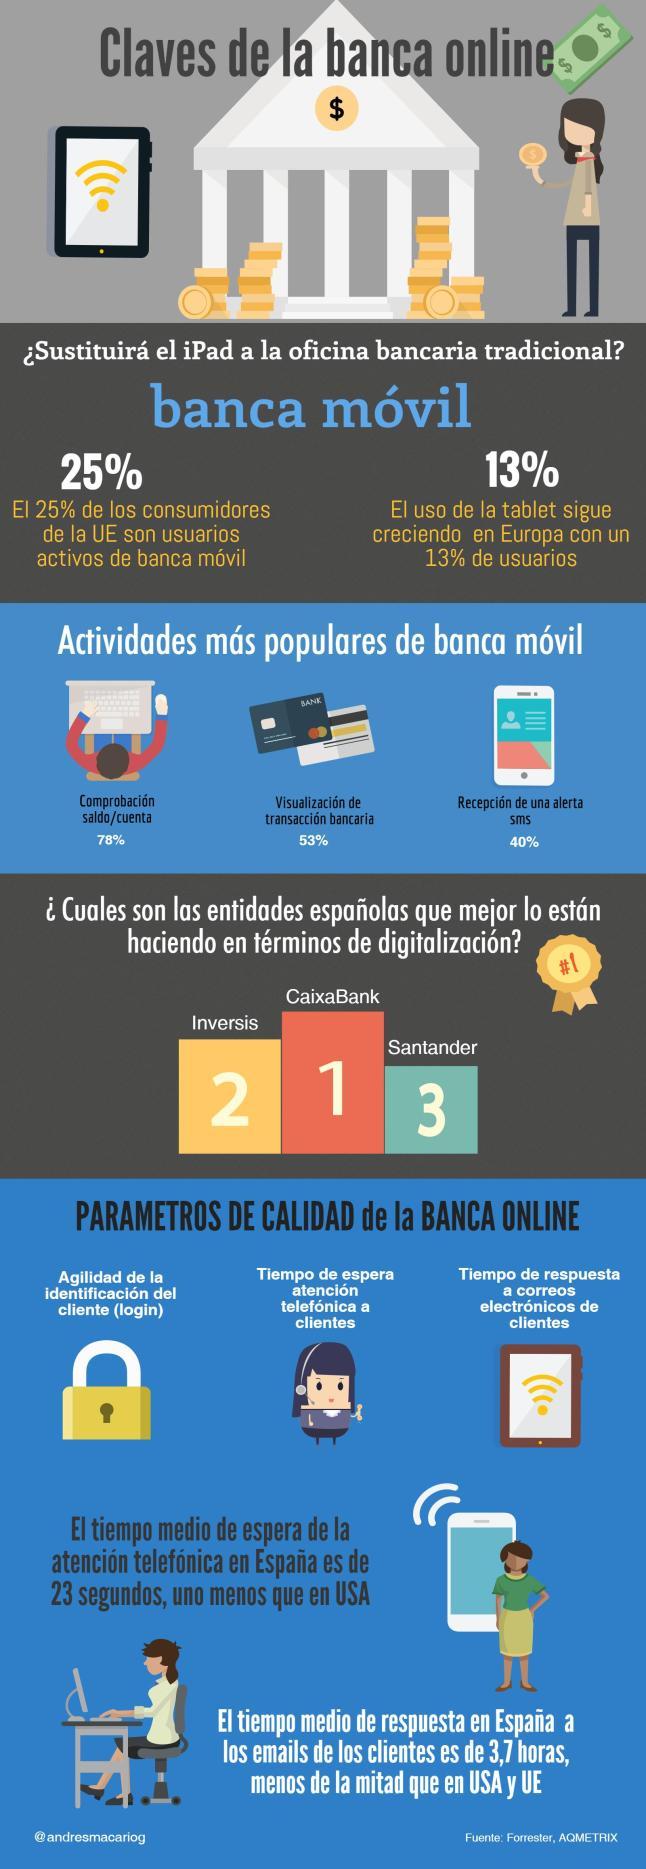 claves-banca-online-infografia